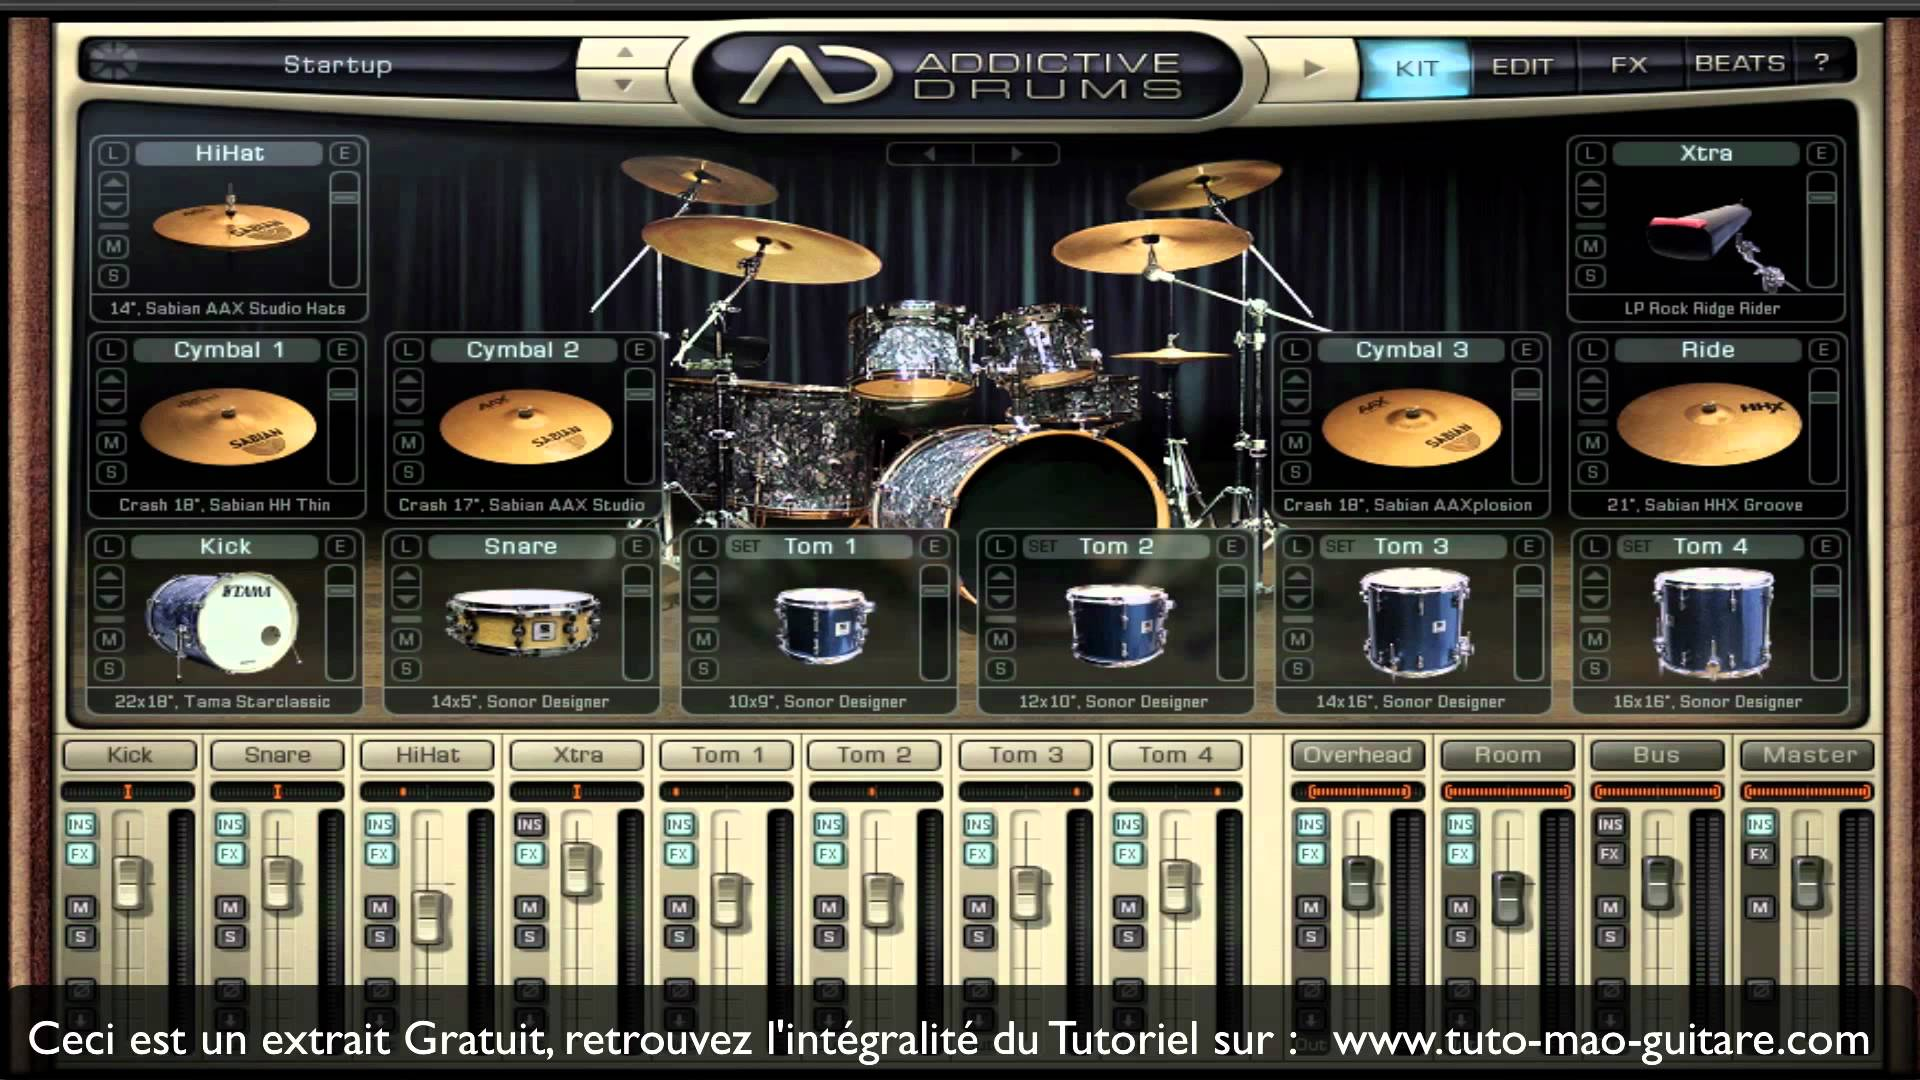 Addictive drums.jpg